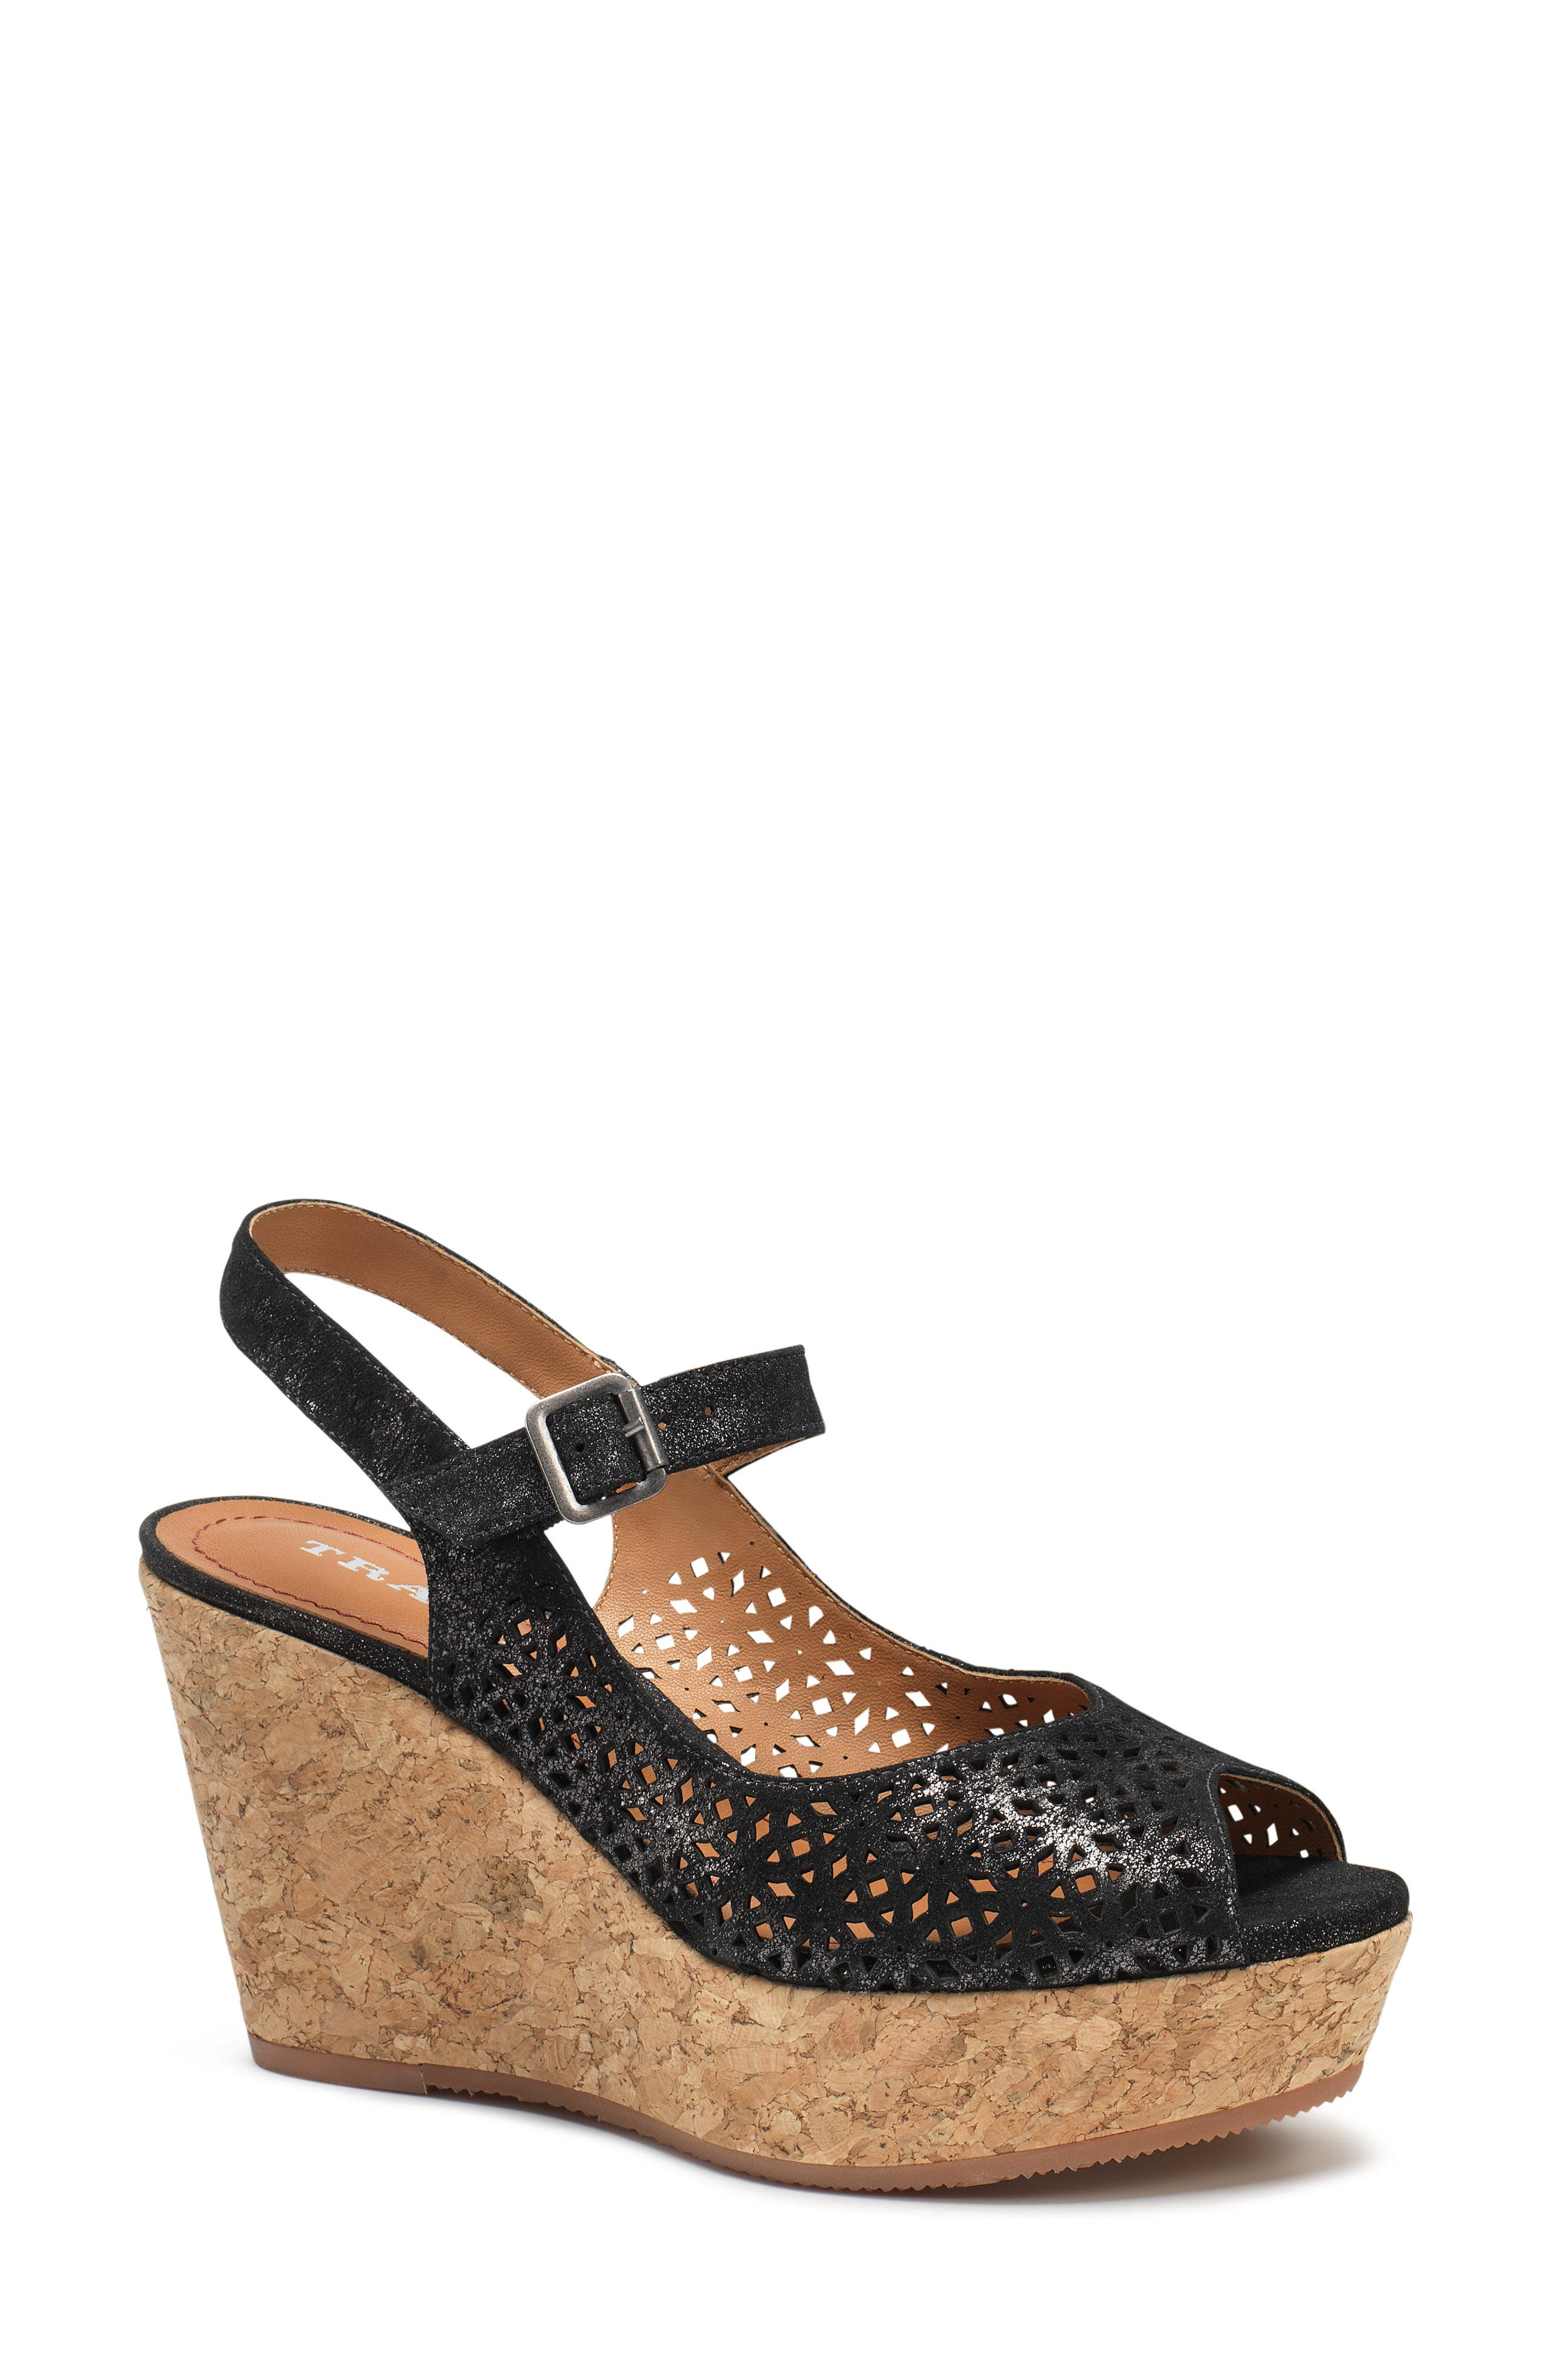 Pattie Wedge Sandal,                         Main,                         color, BLACK METALLIC SUEDE